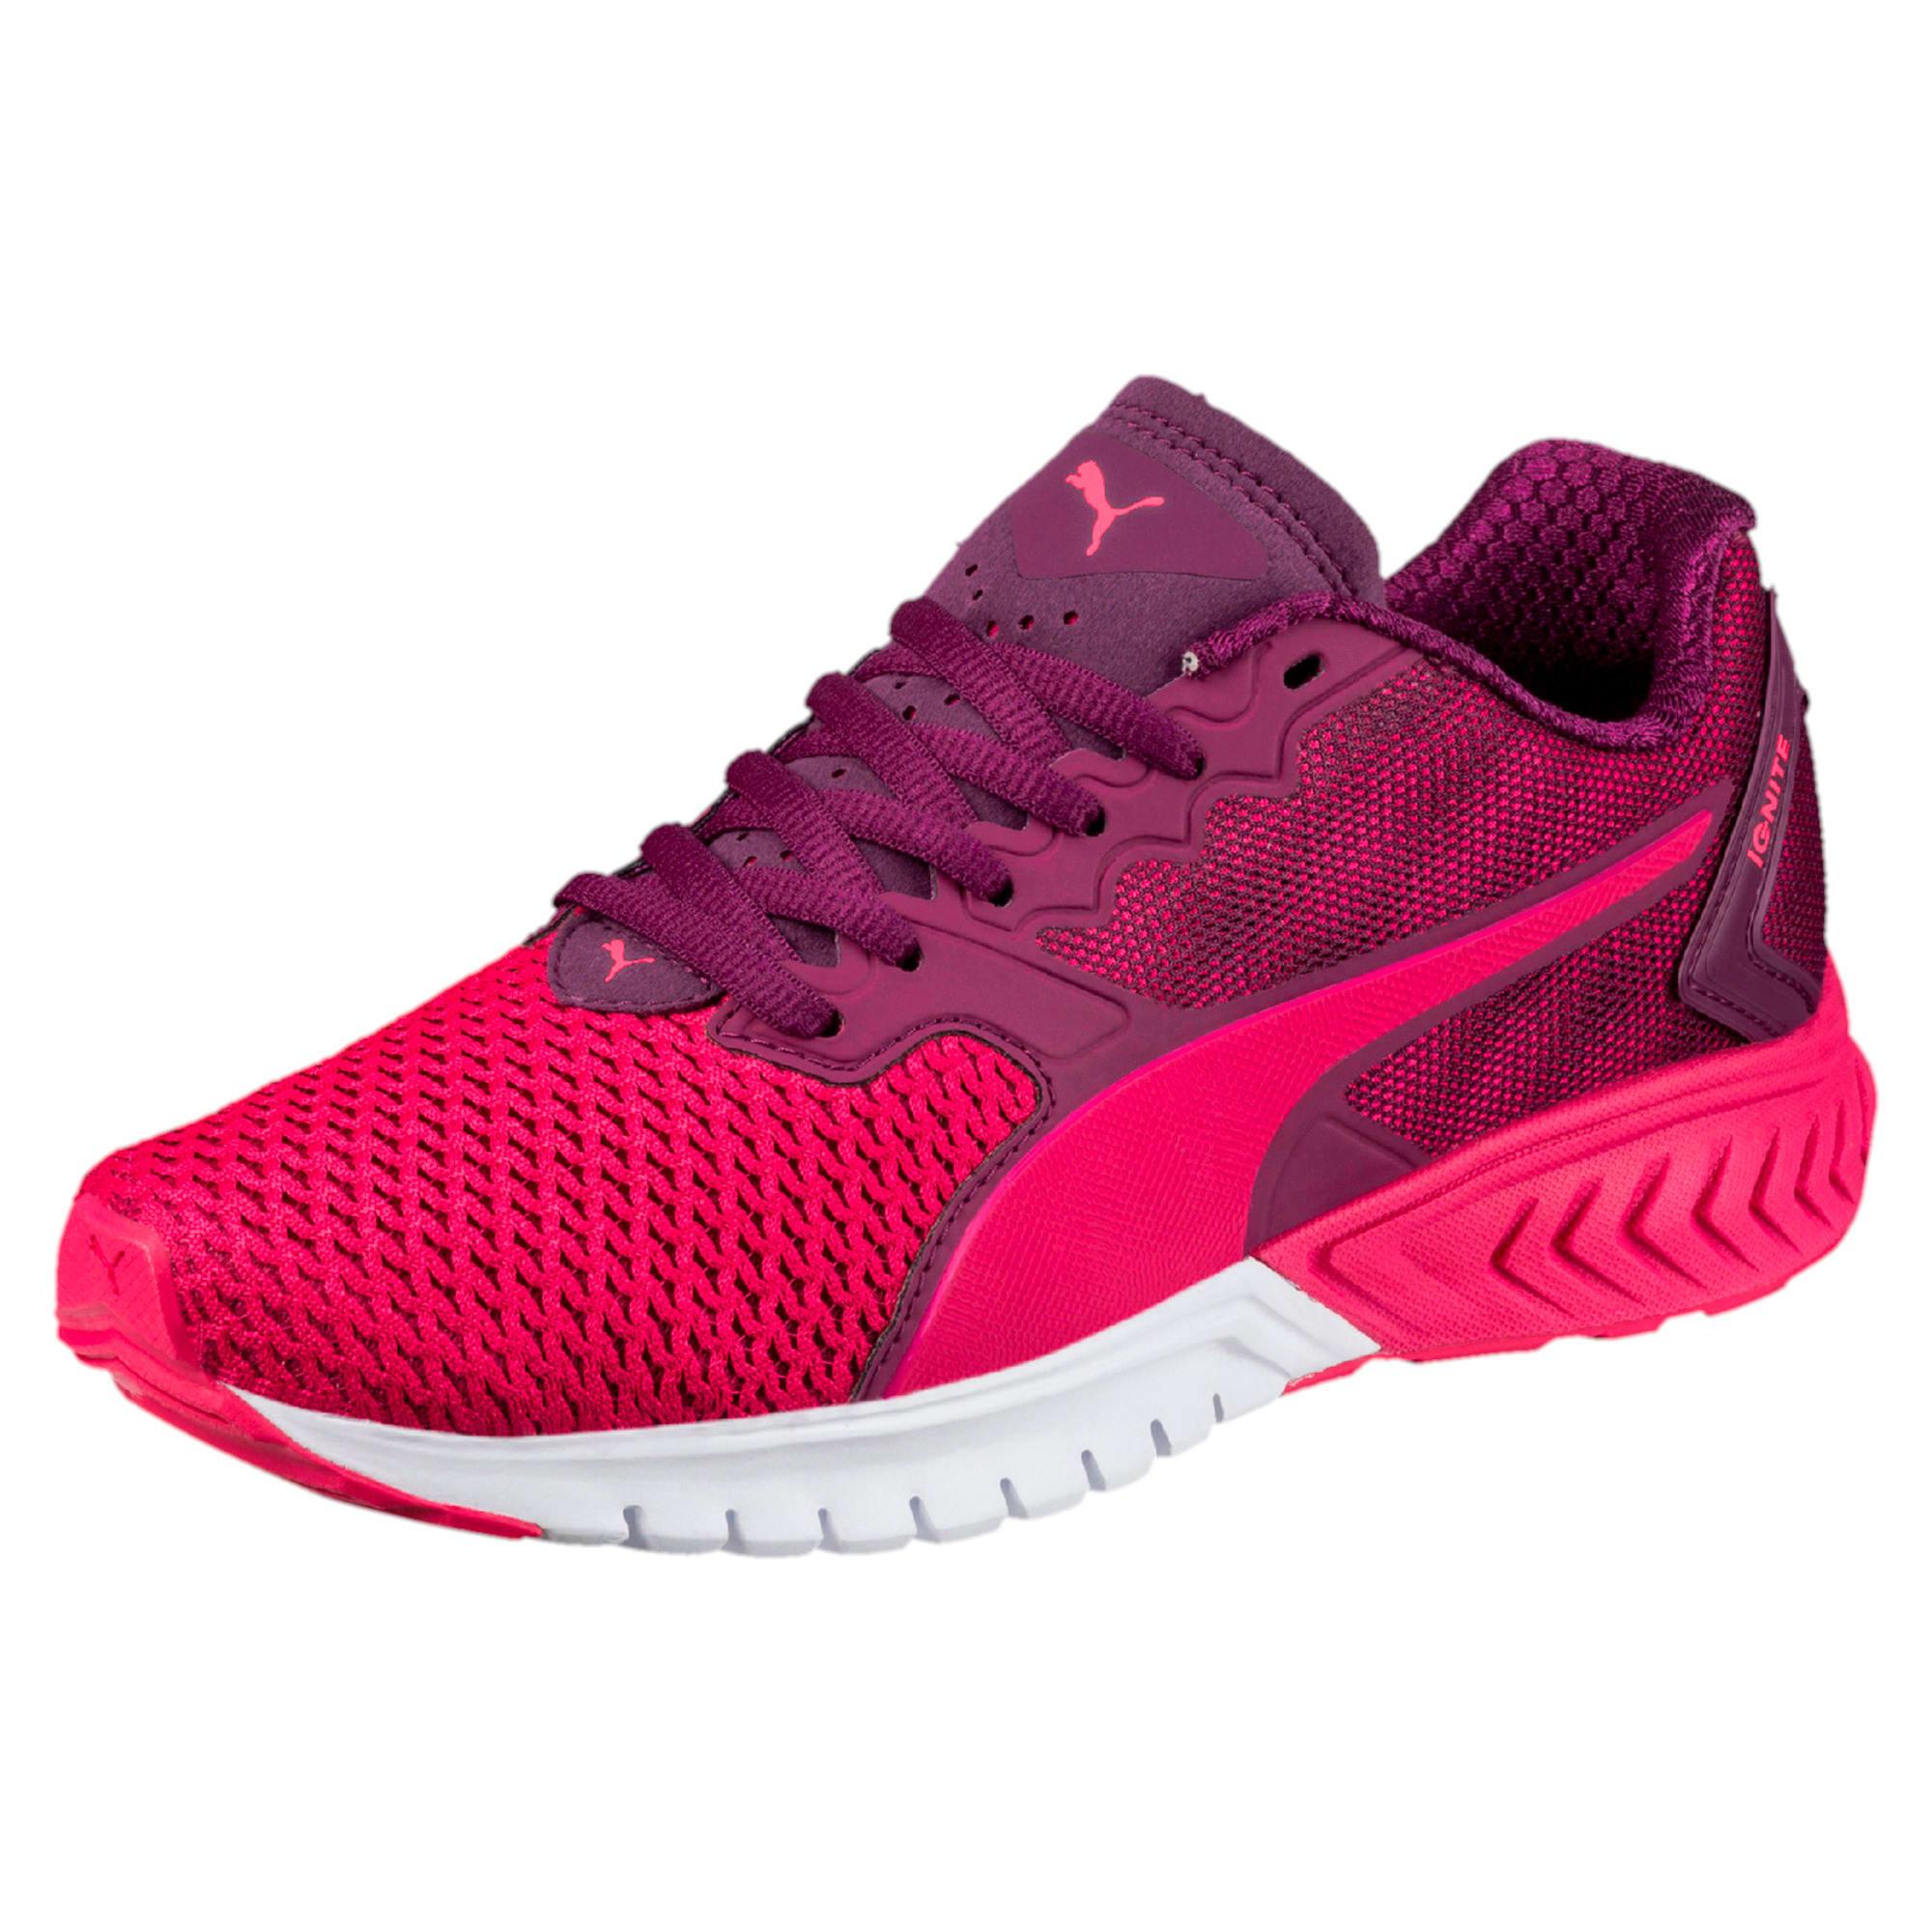 Thumbnail 1 of IGNITE Dual Mesh Kids' Running Shoes, Love Potion-Dark Purple, medium-IND